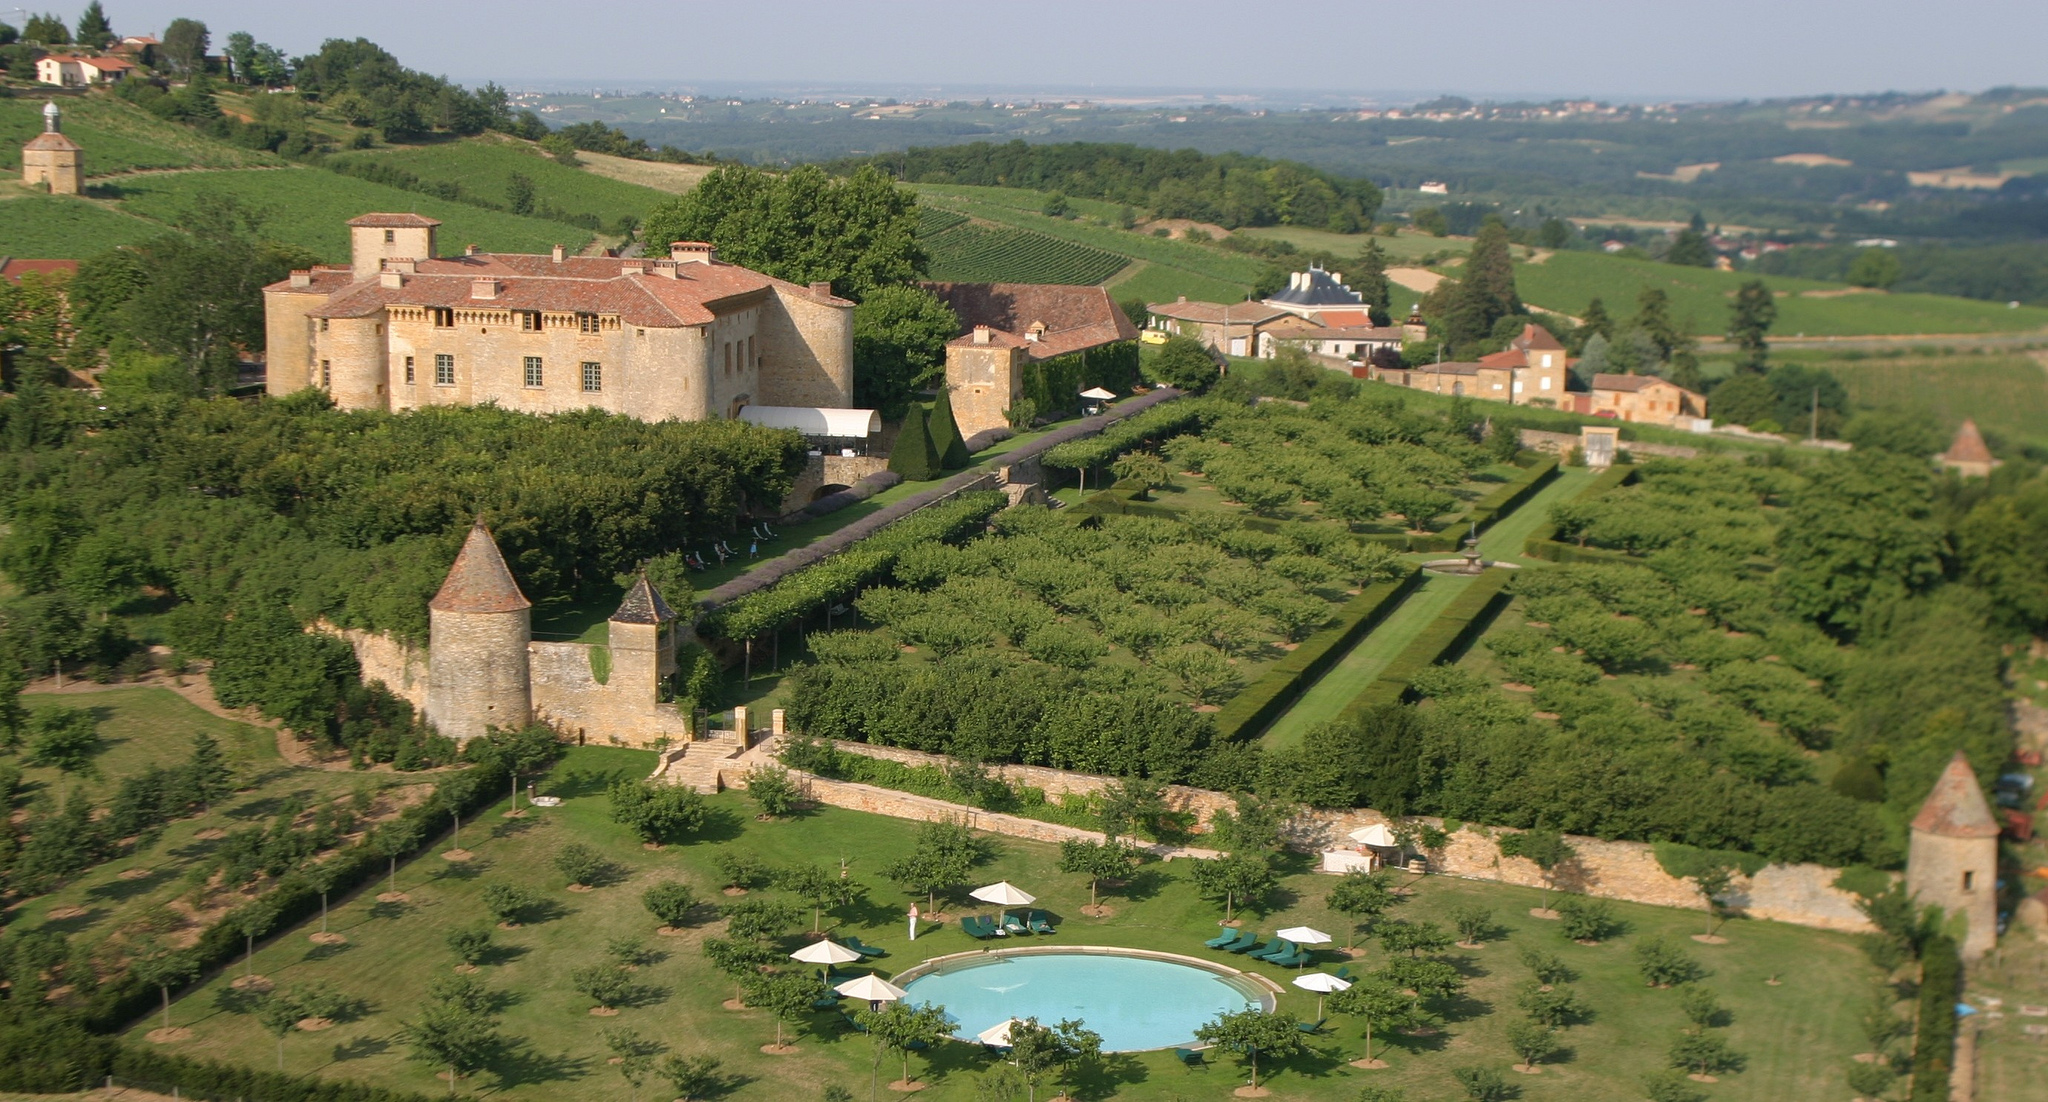 Château de Bagnols | © Corona Mejora Tu Vida/ Flickr